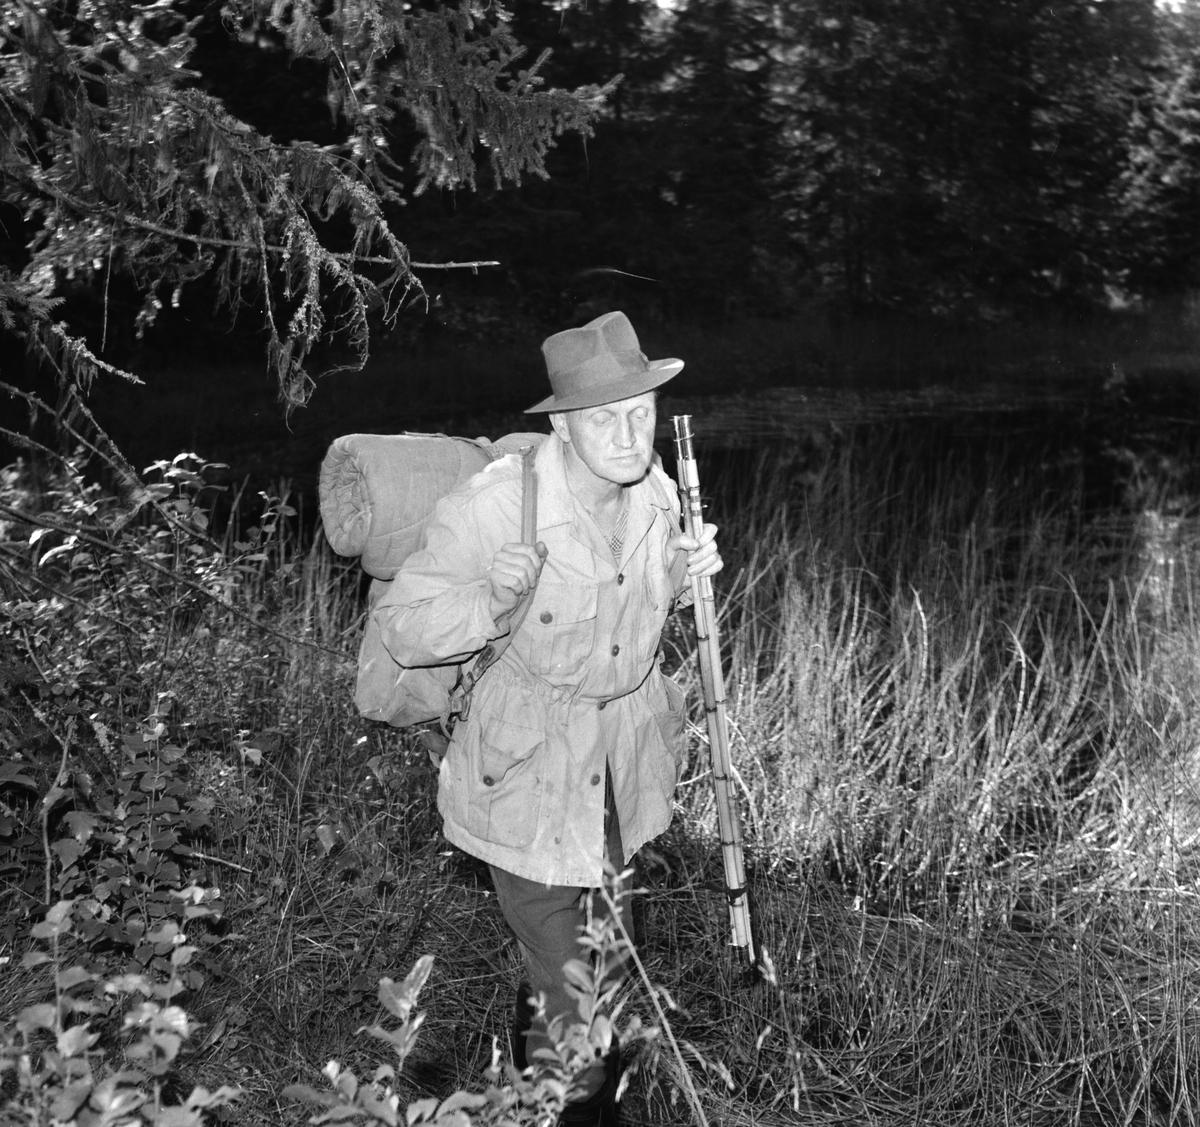 Guttorm P. Haugen. (f. 1911-d. ) Portrett, med sekk og fiskestang. Friluftsliv.  kunstner; visedikter, forfatter og maler.